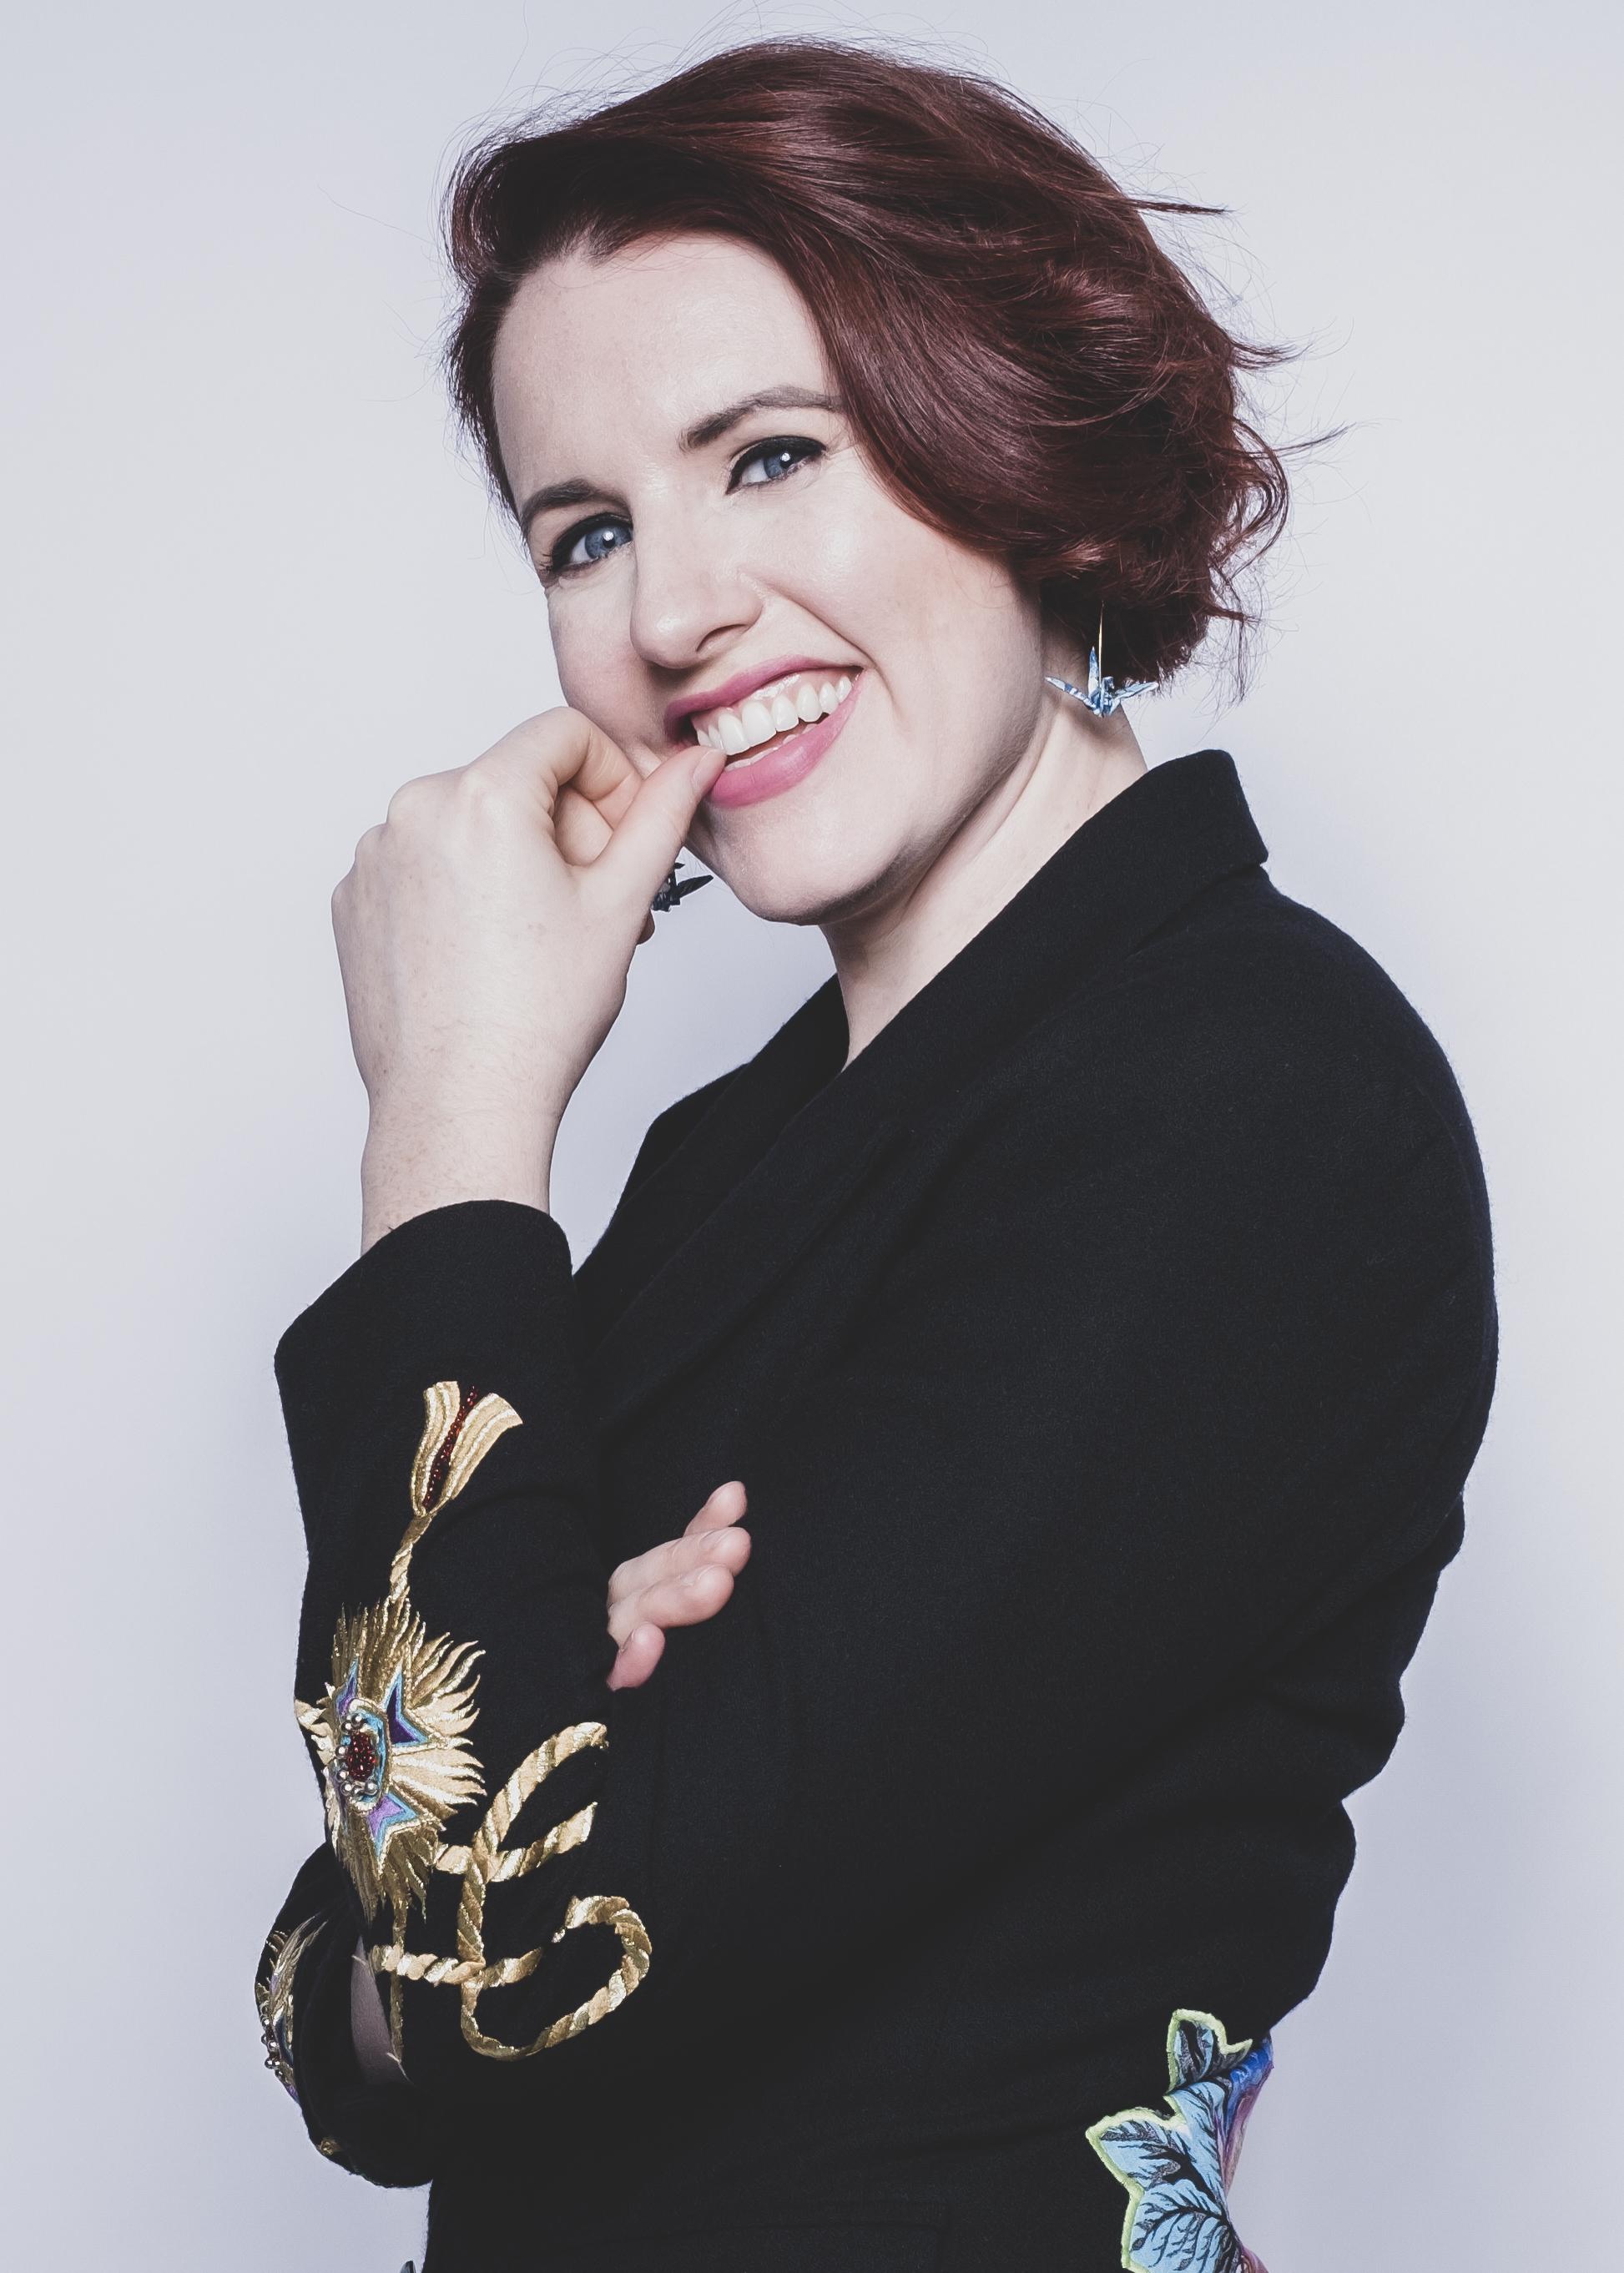 Naomi O'Connell